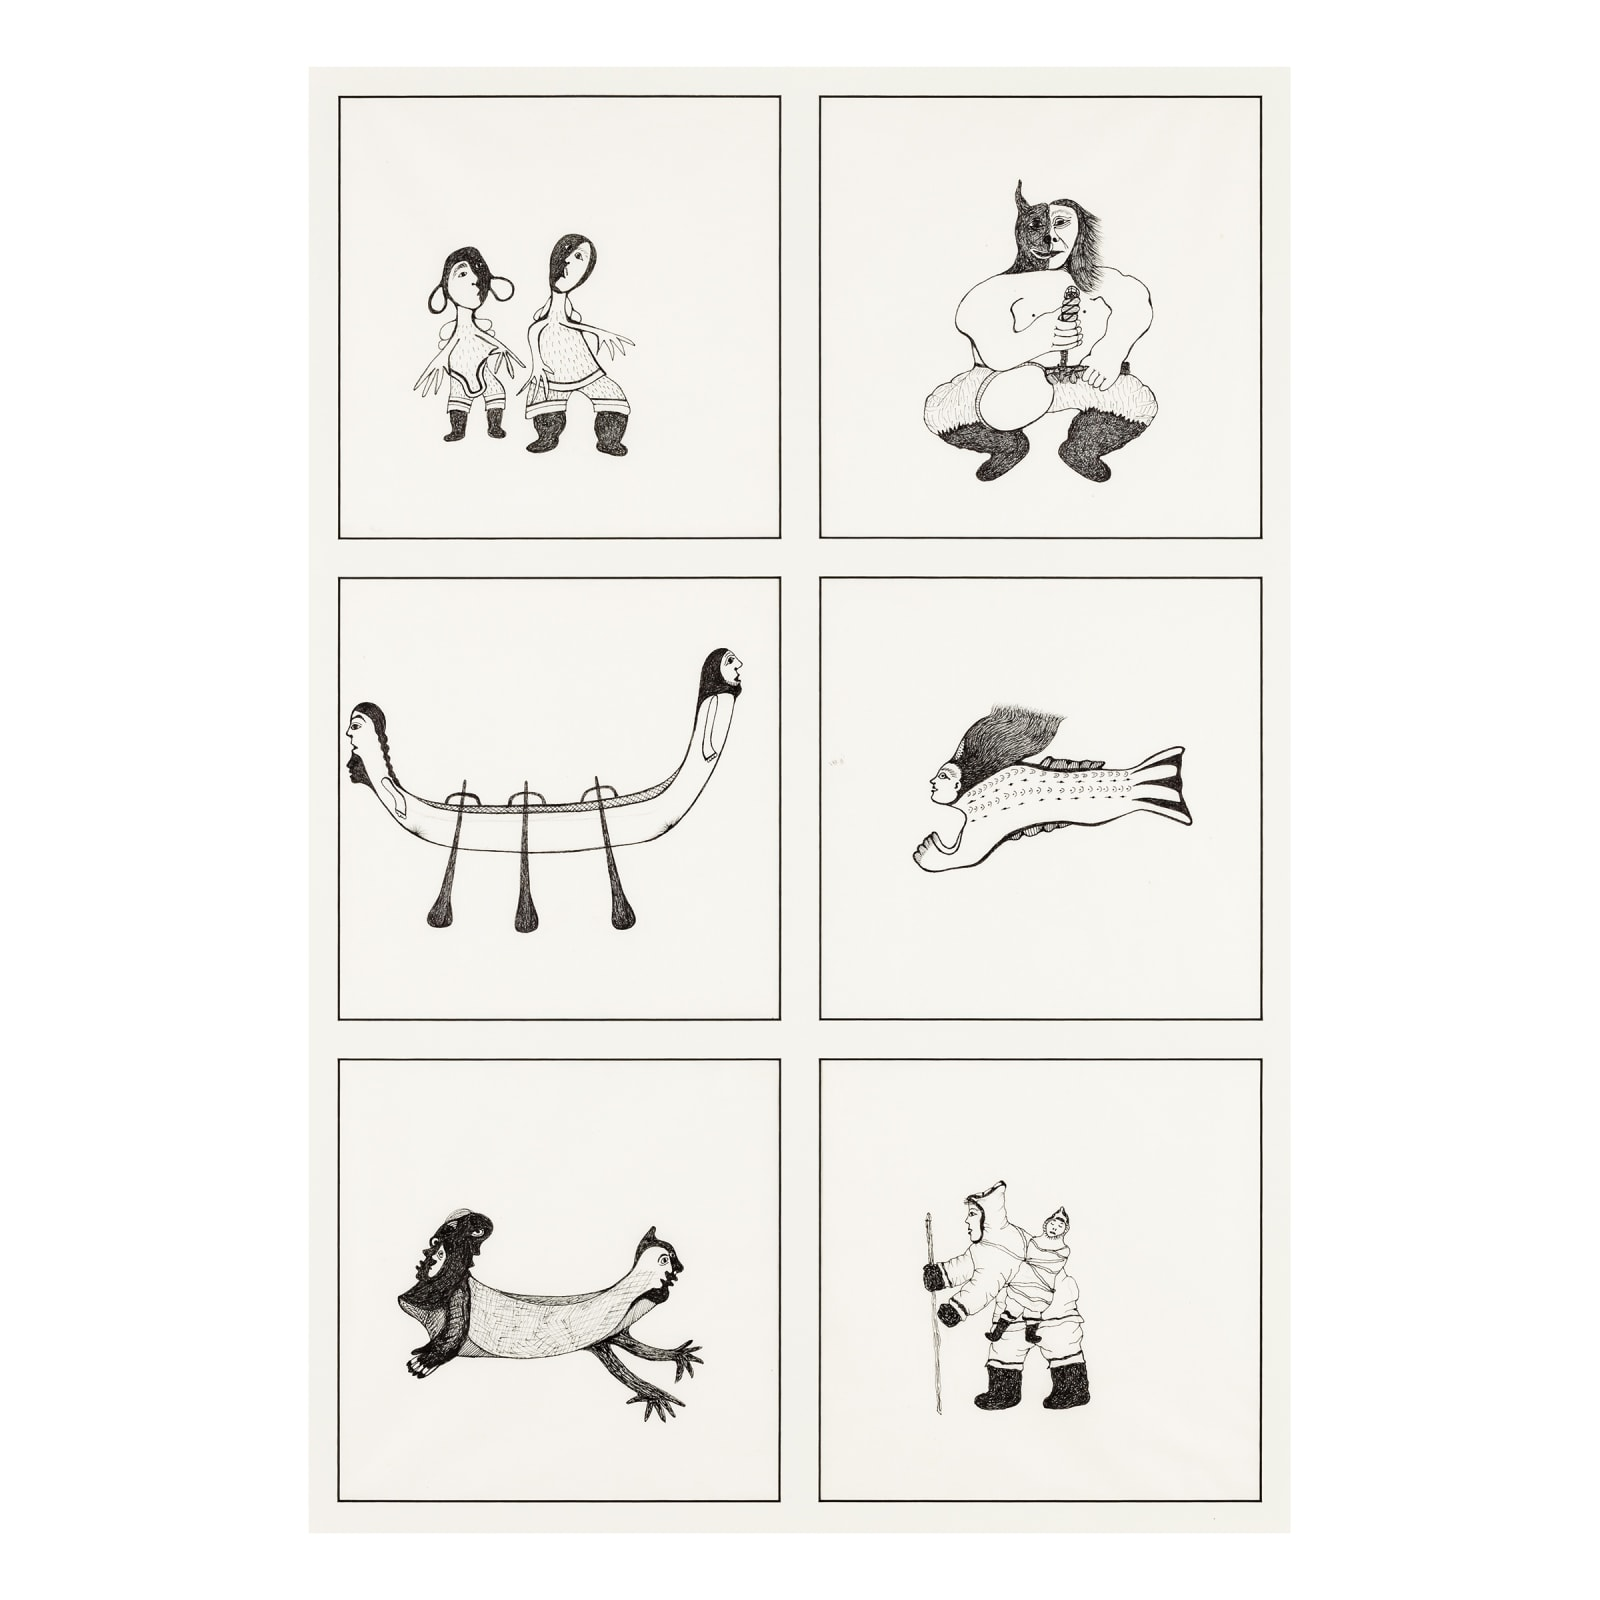 PITALOOSIE SAILA, R.C.A. (1942-) KINNGAIT (CAPE DORSET) Six Drawings, 2012 REALIZED: $2,280